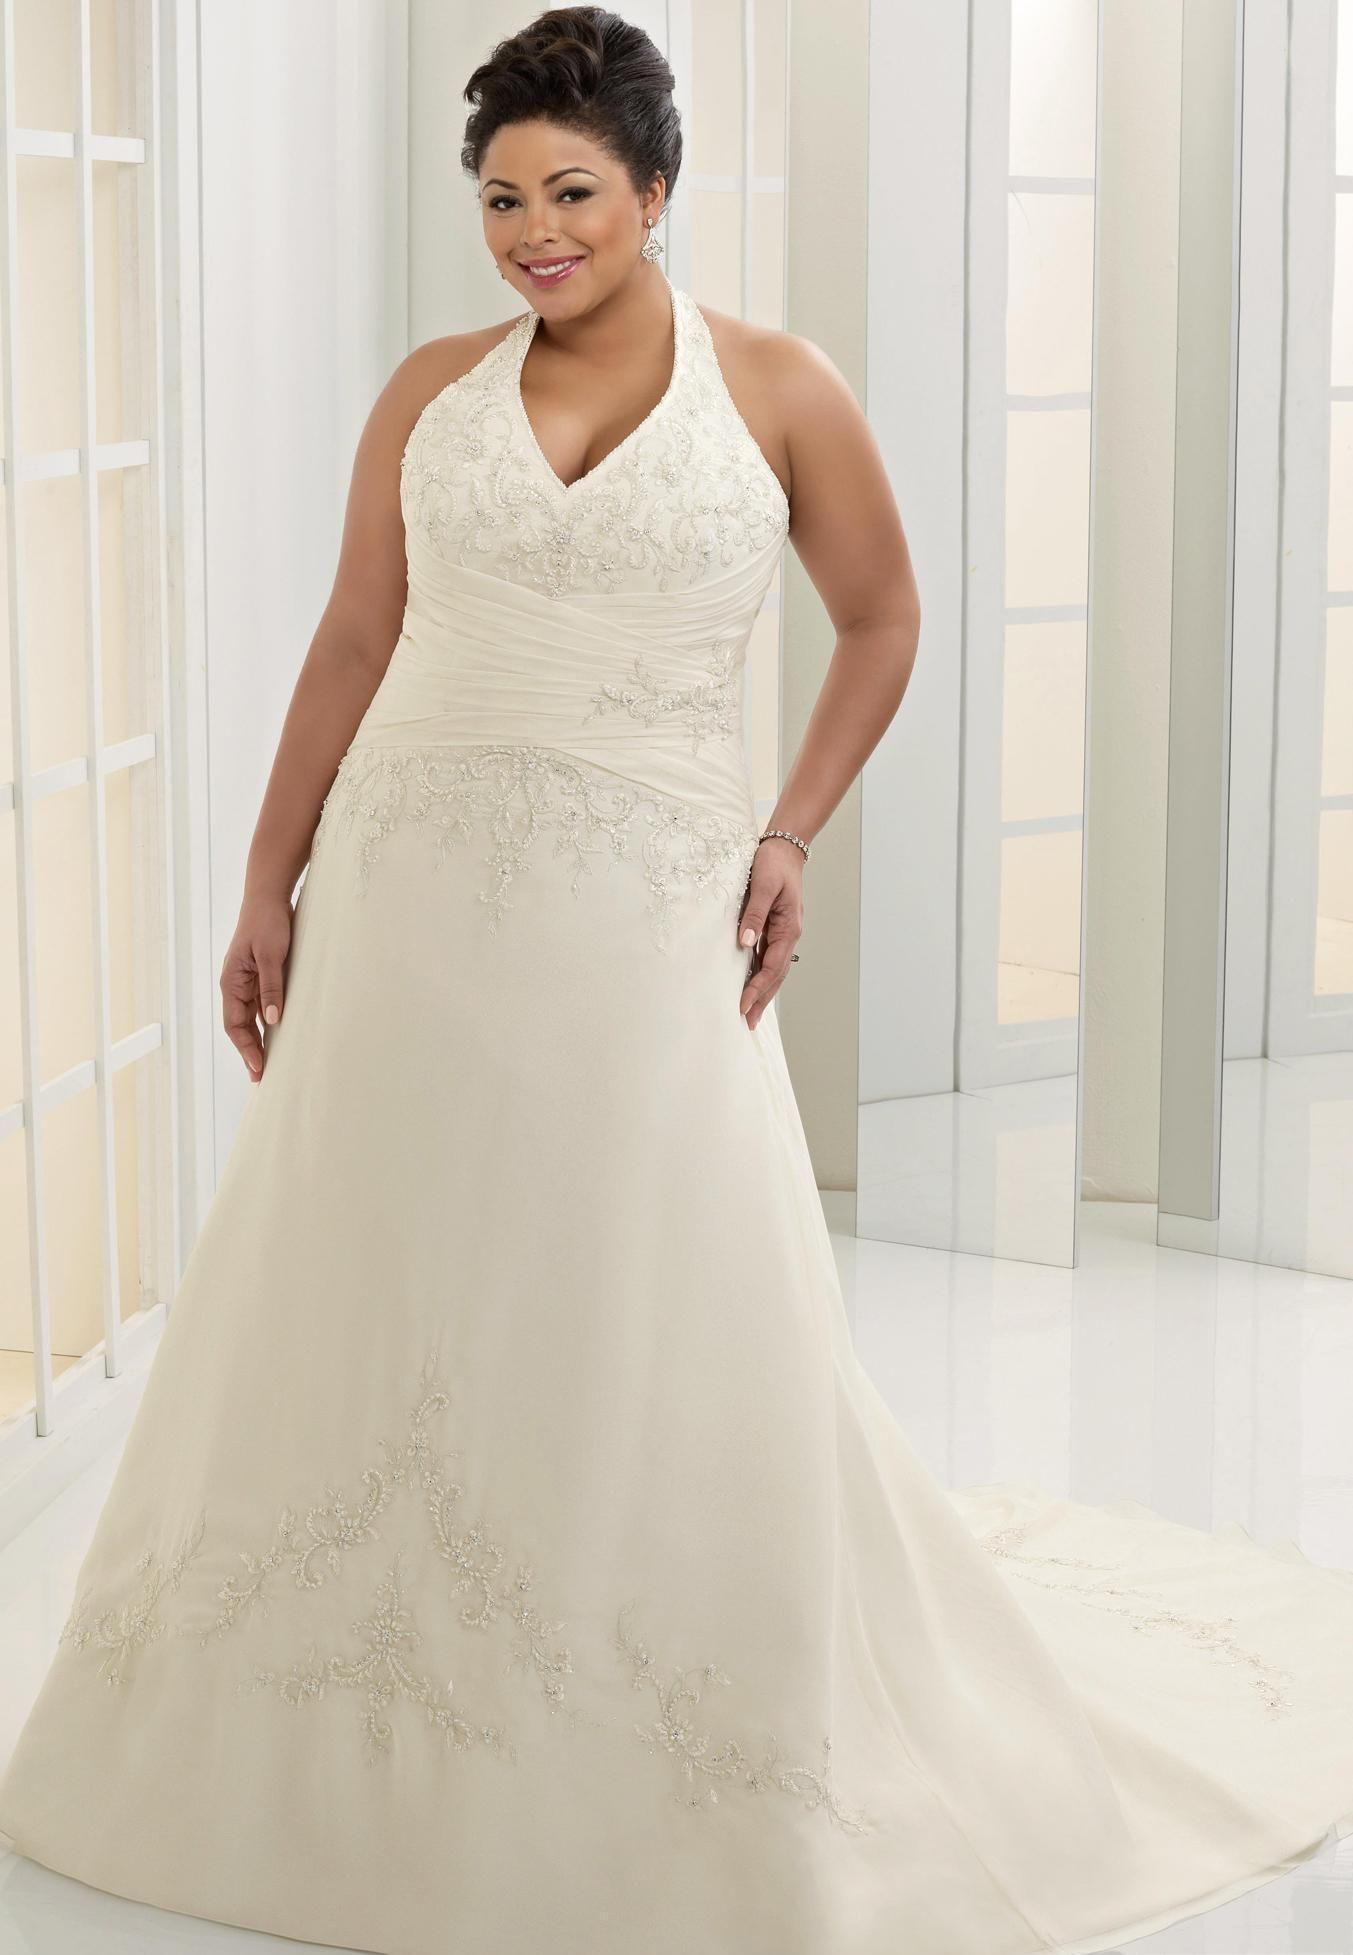 wedding dresses princess wedding dresses 2013 wedding